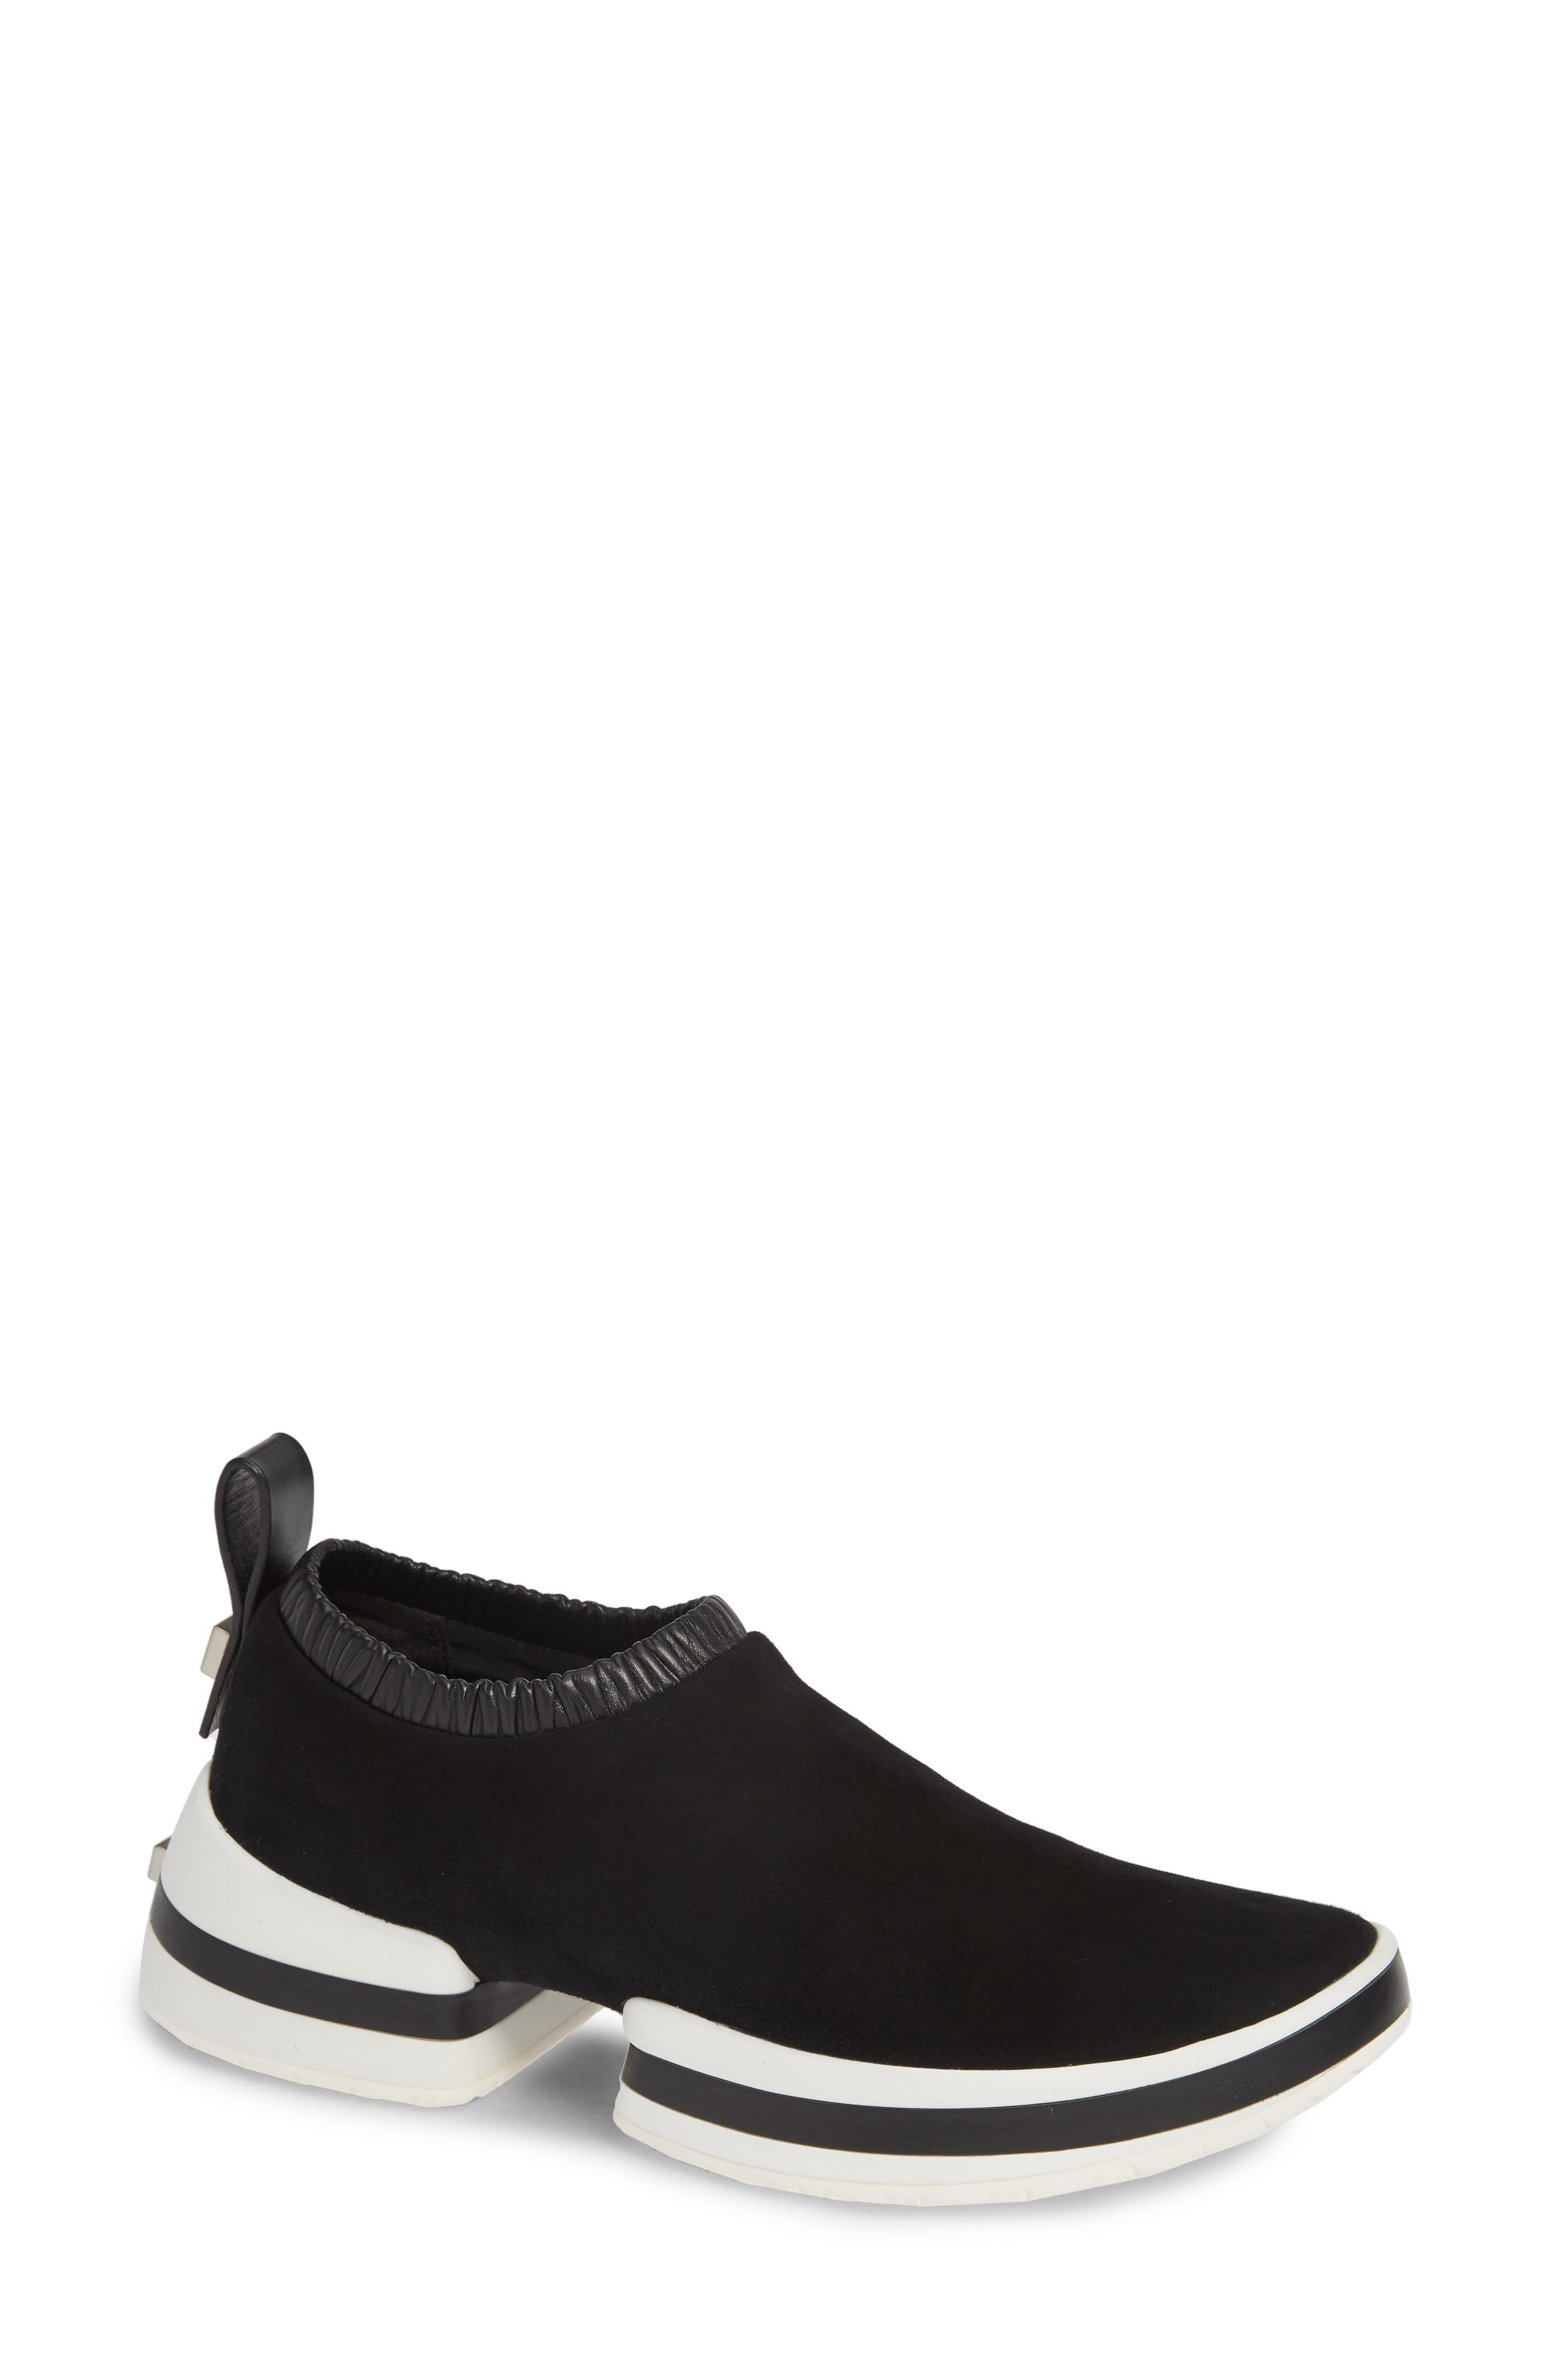 612 Sneaker,                             Main thumbnail 1, color,                             BLACK SUEDE